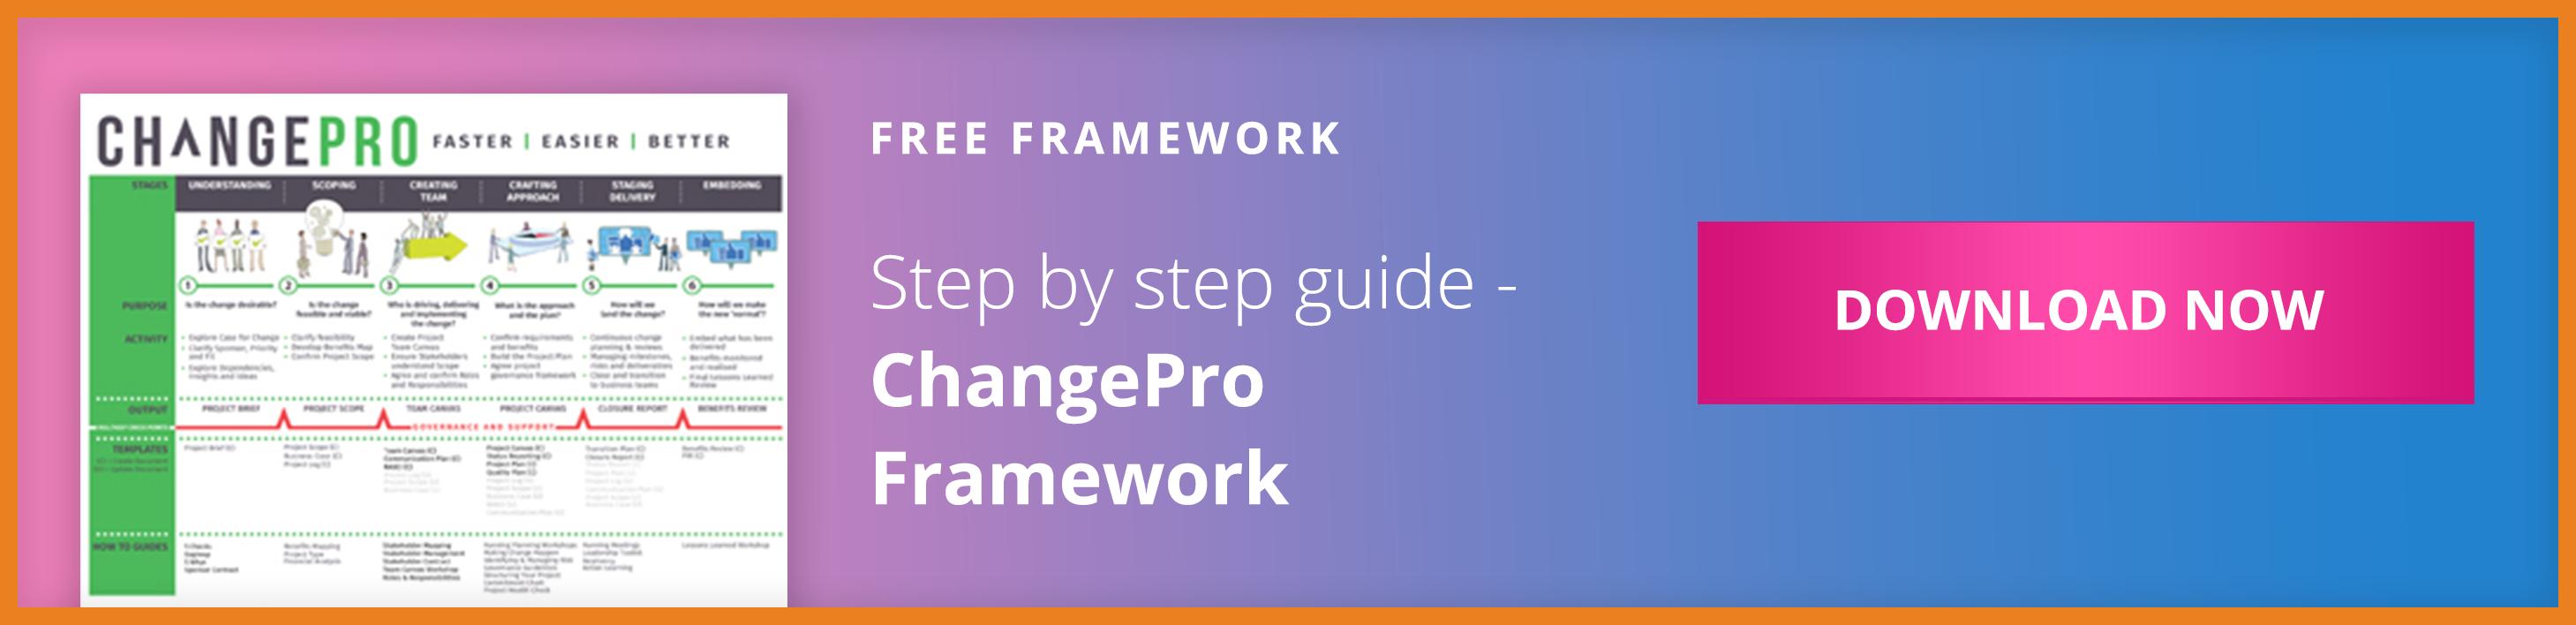 ChangePro Framework CTA